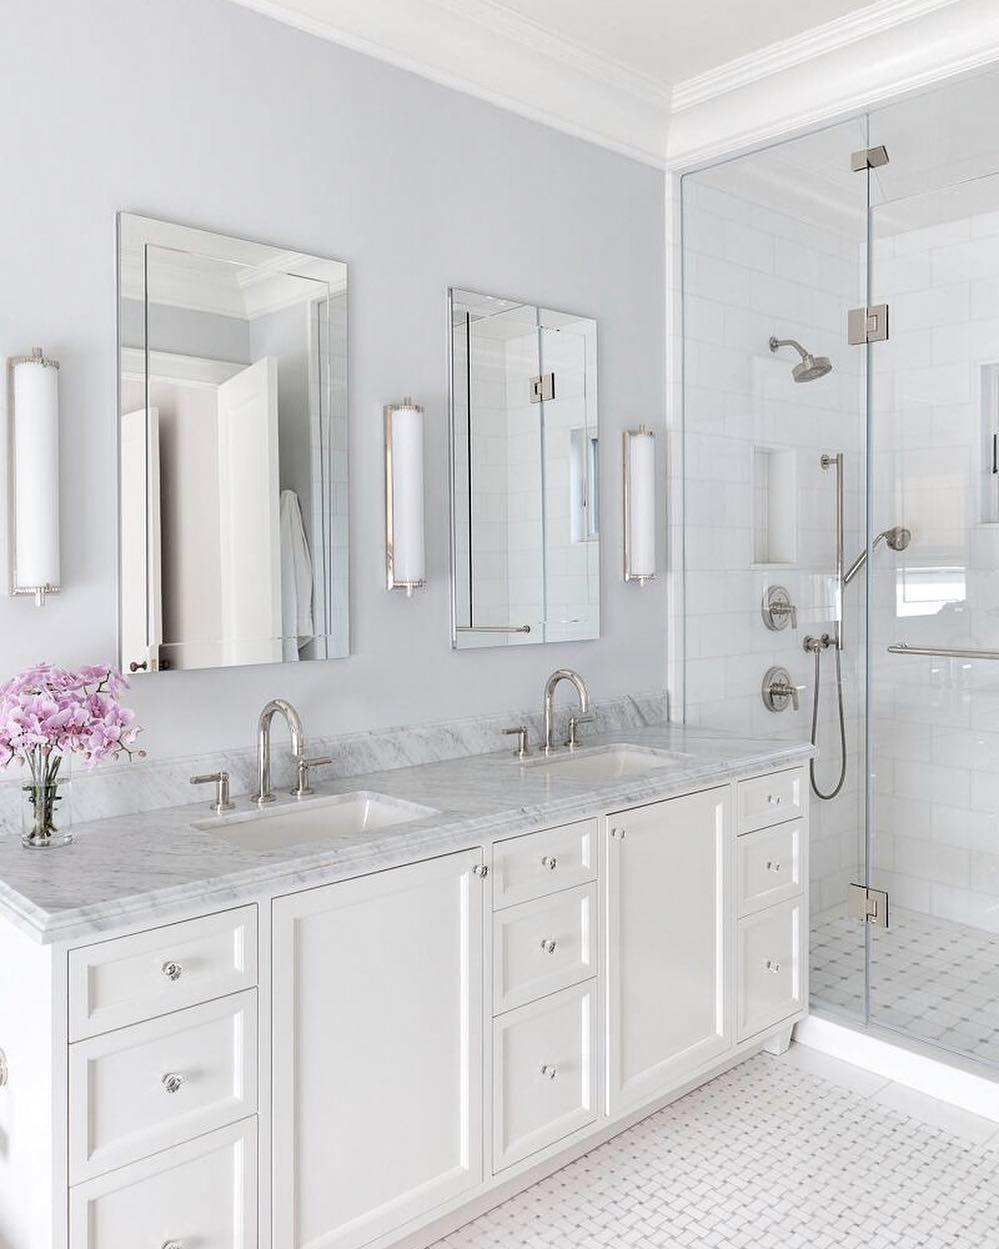 bathroom mirror ideas to reflect your style bathroom on vanity bathroom id=32735